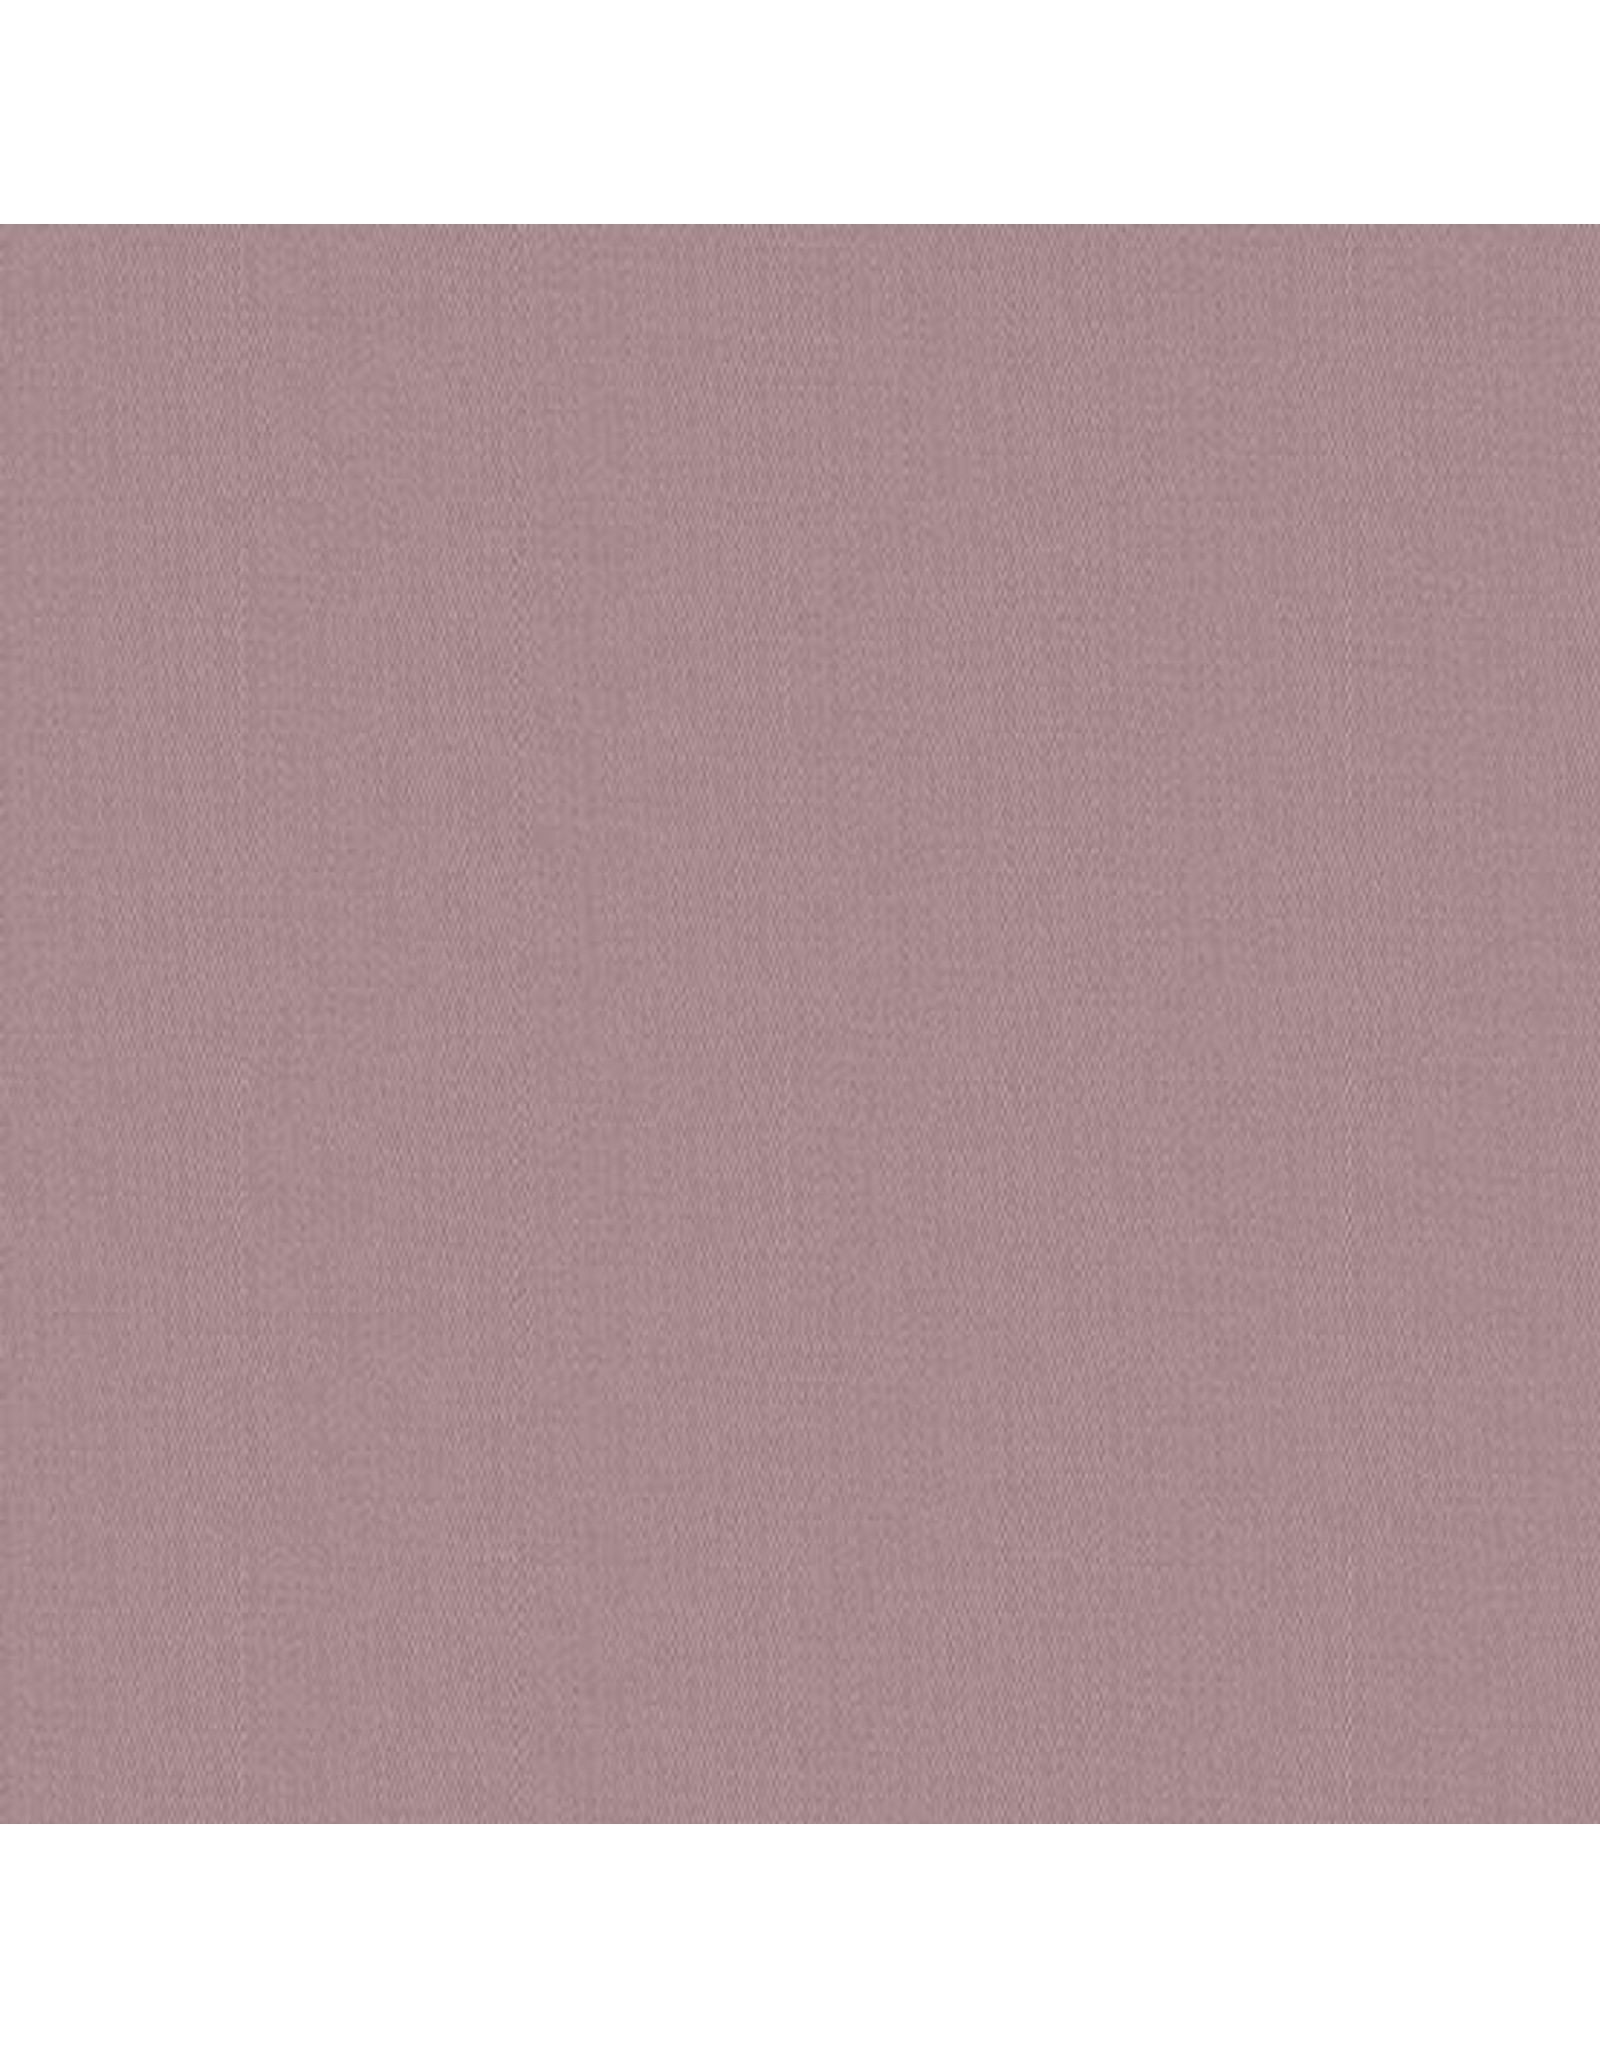 Alison Glass Kaleidoscope 2021 in Wisteria, Fabric Half-Yards K-12